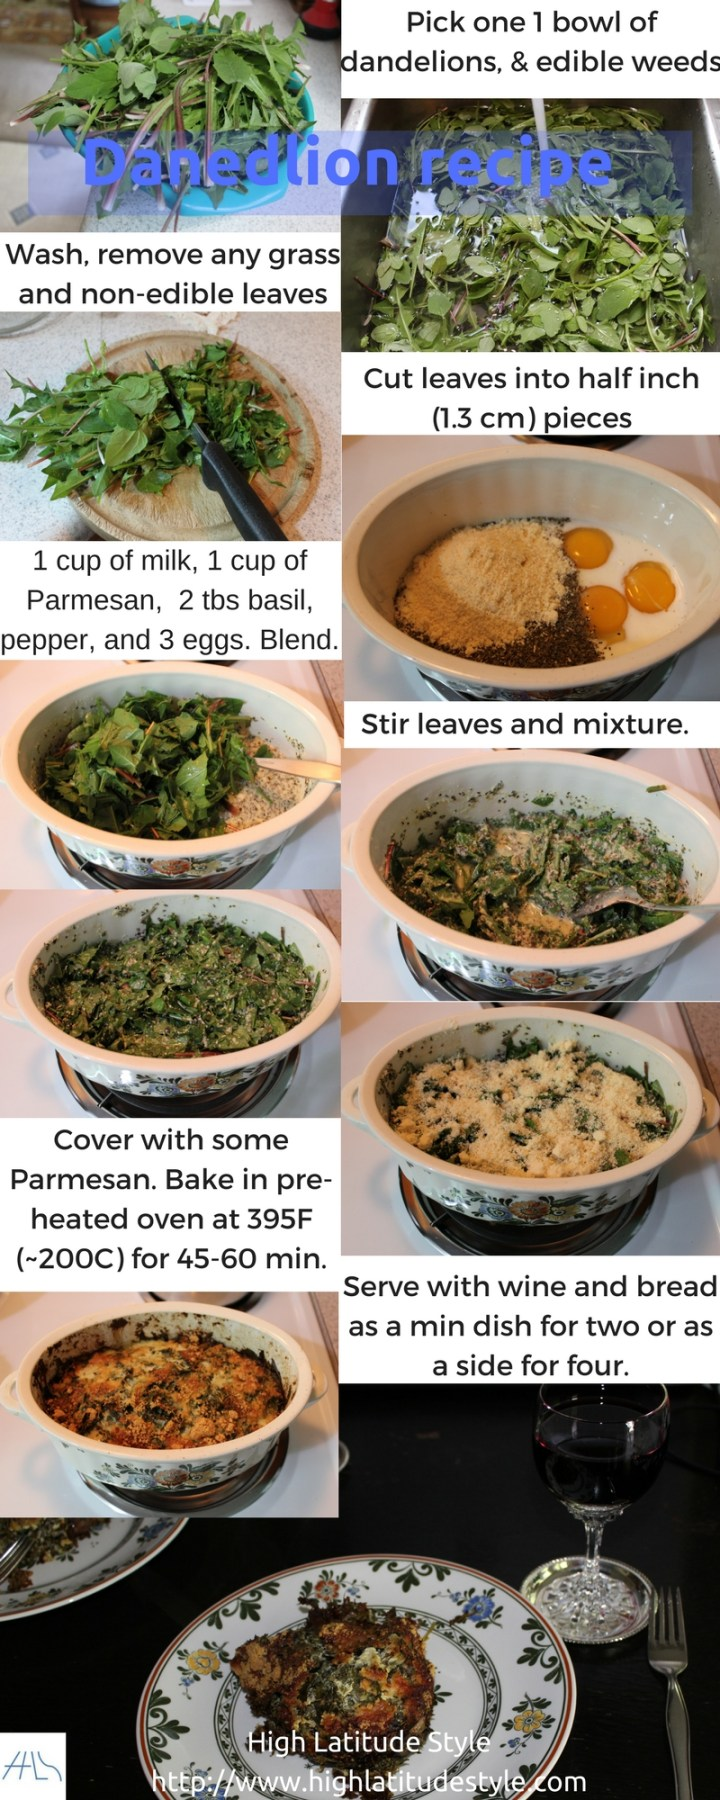 Alaska baked dandelion recipe